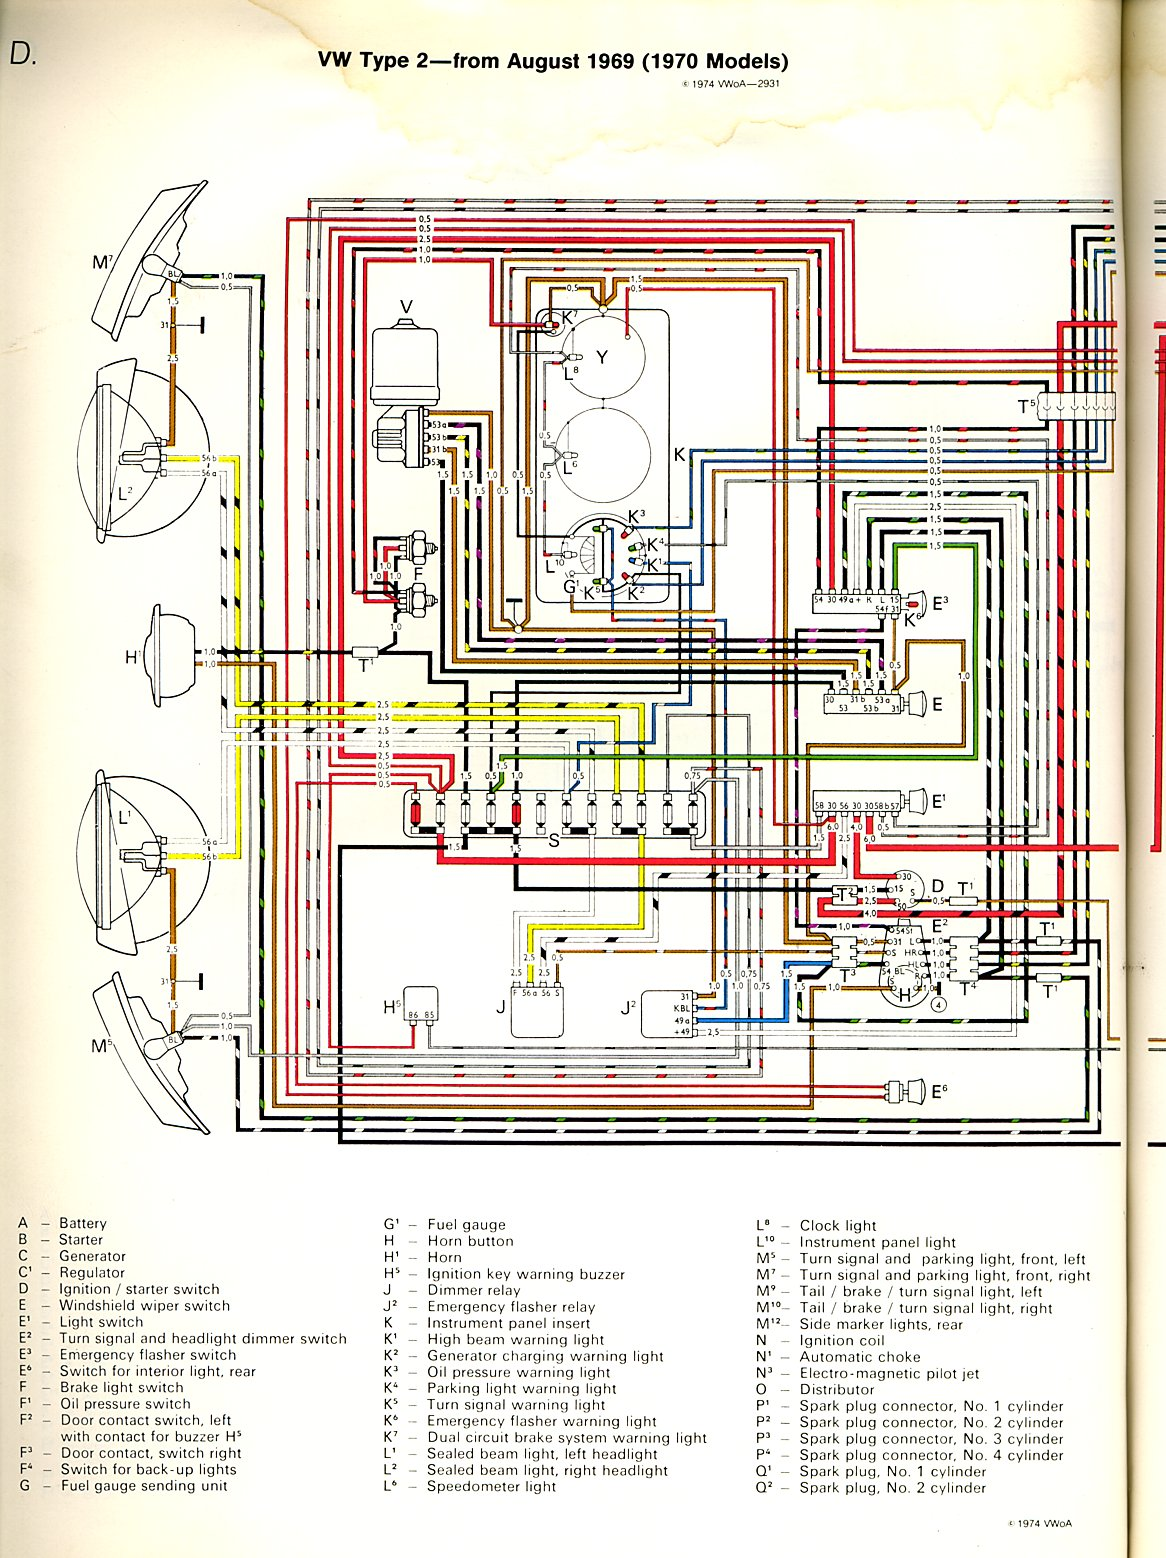 Swell 1970 Bus Wiring Diagram Thegoldenbug Com Wiring Cloud Licukaidewilluminateatxorg